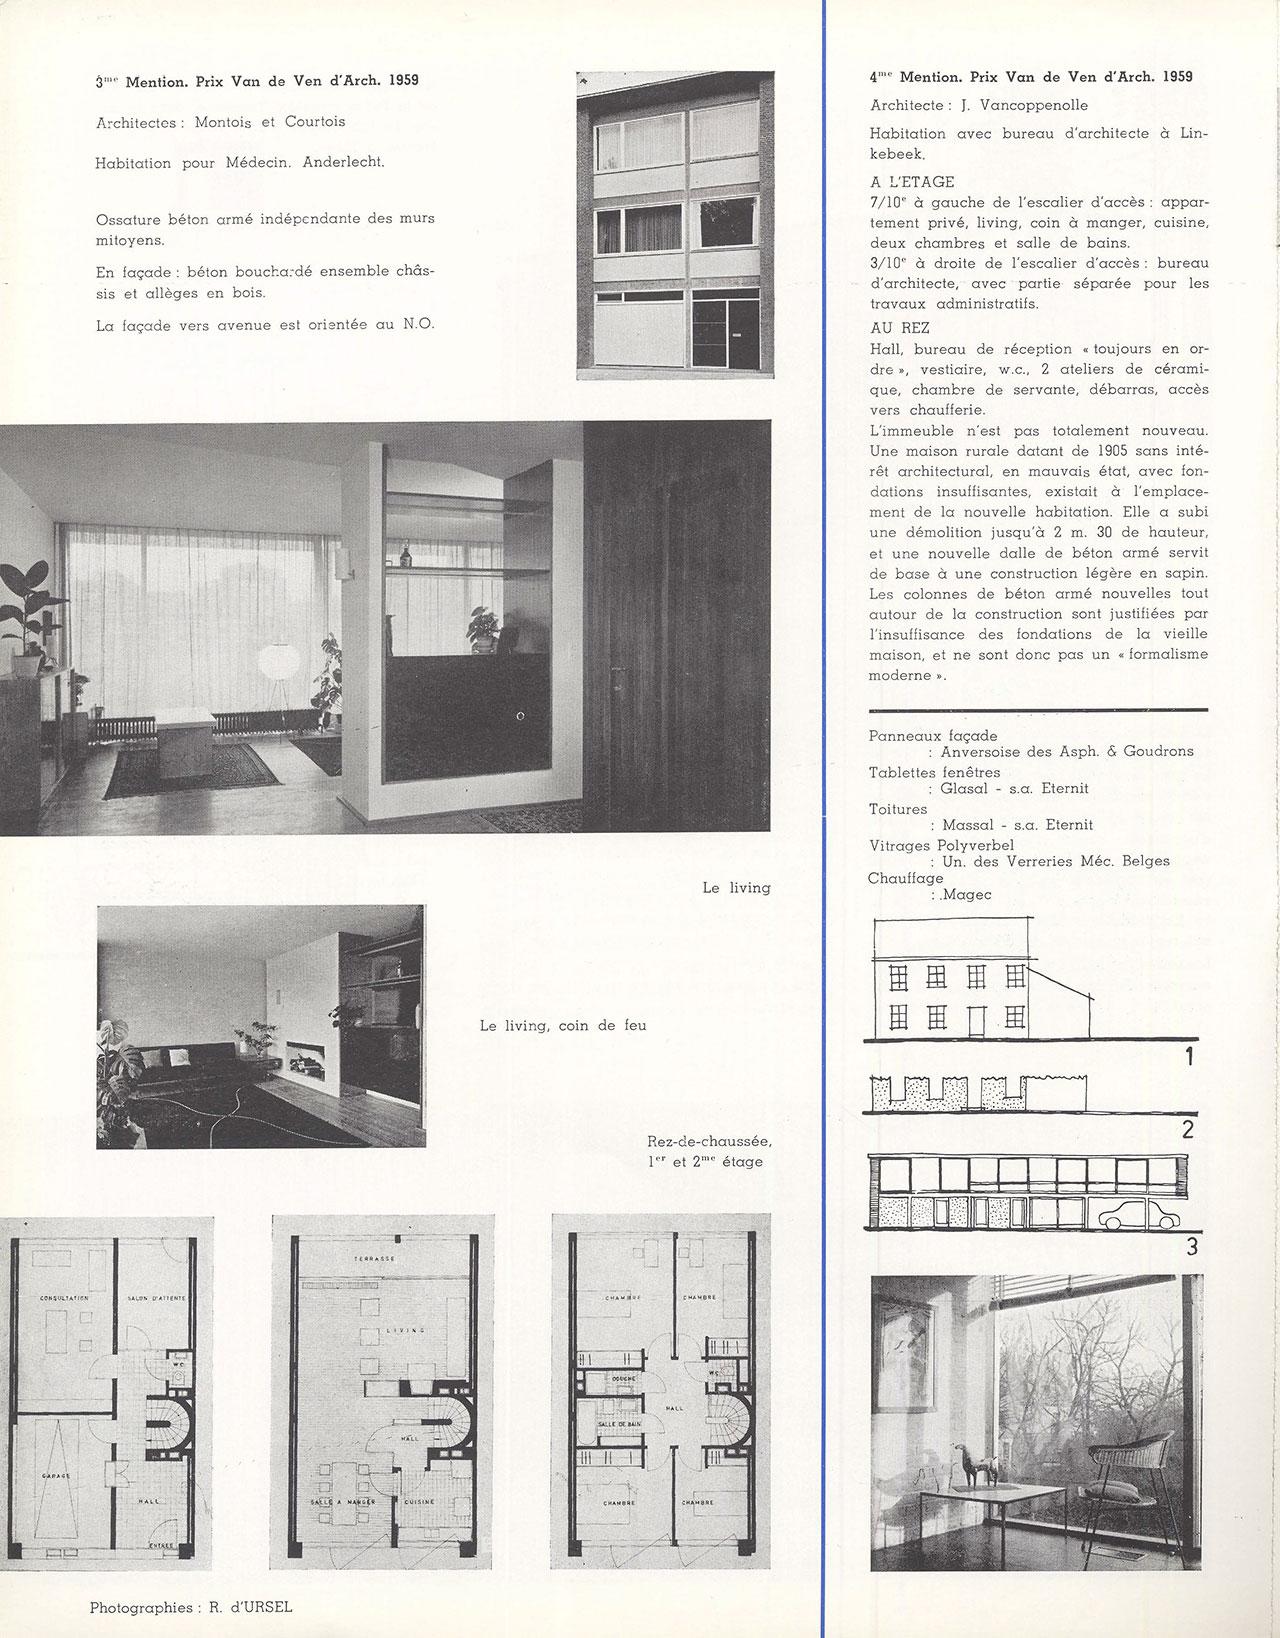 Habitation pour médecin, Anderlecht